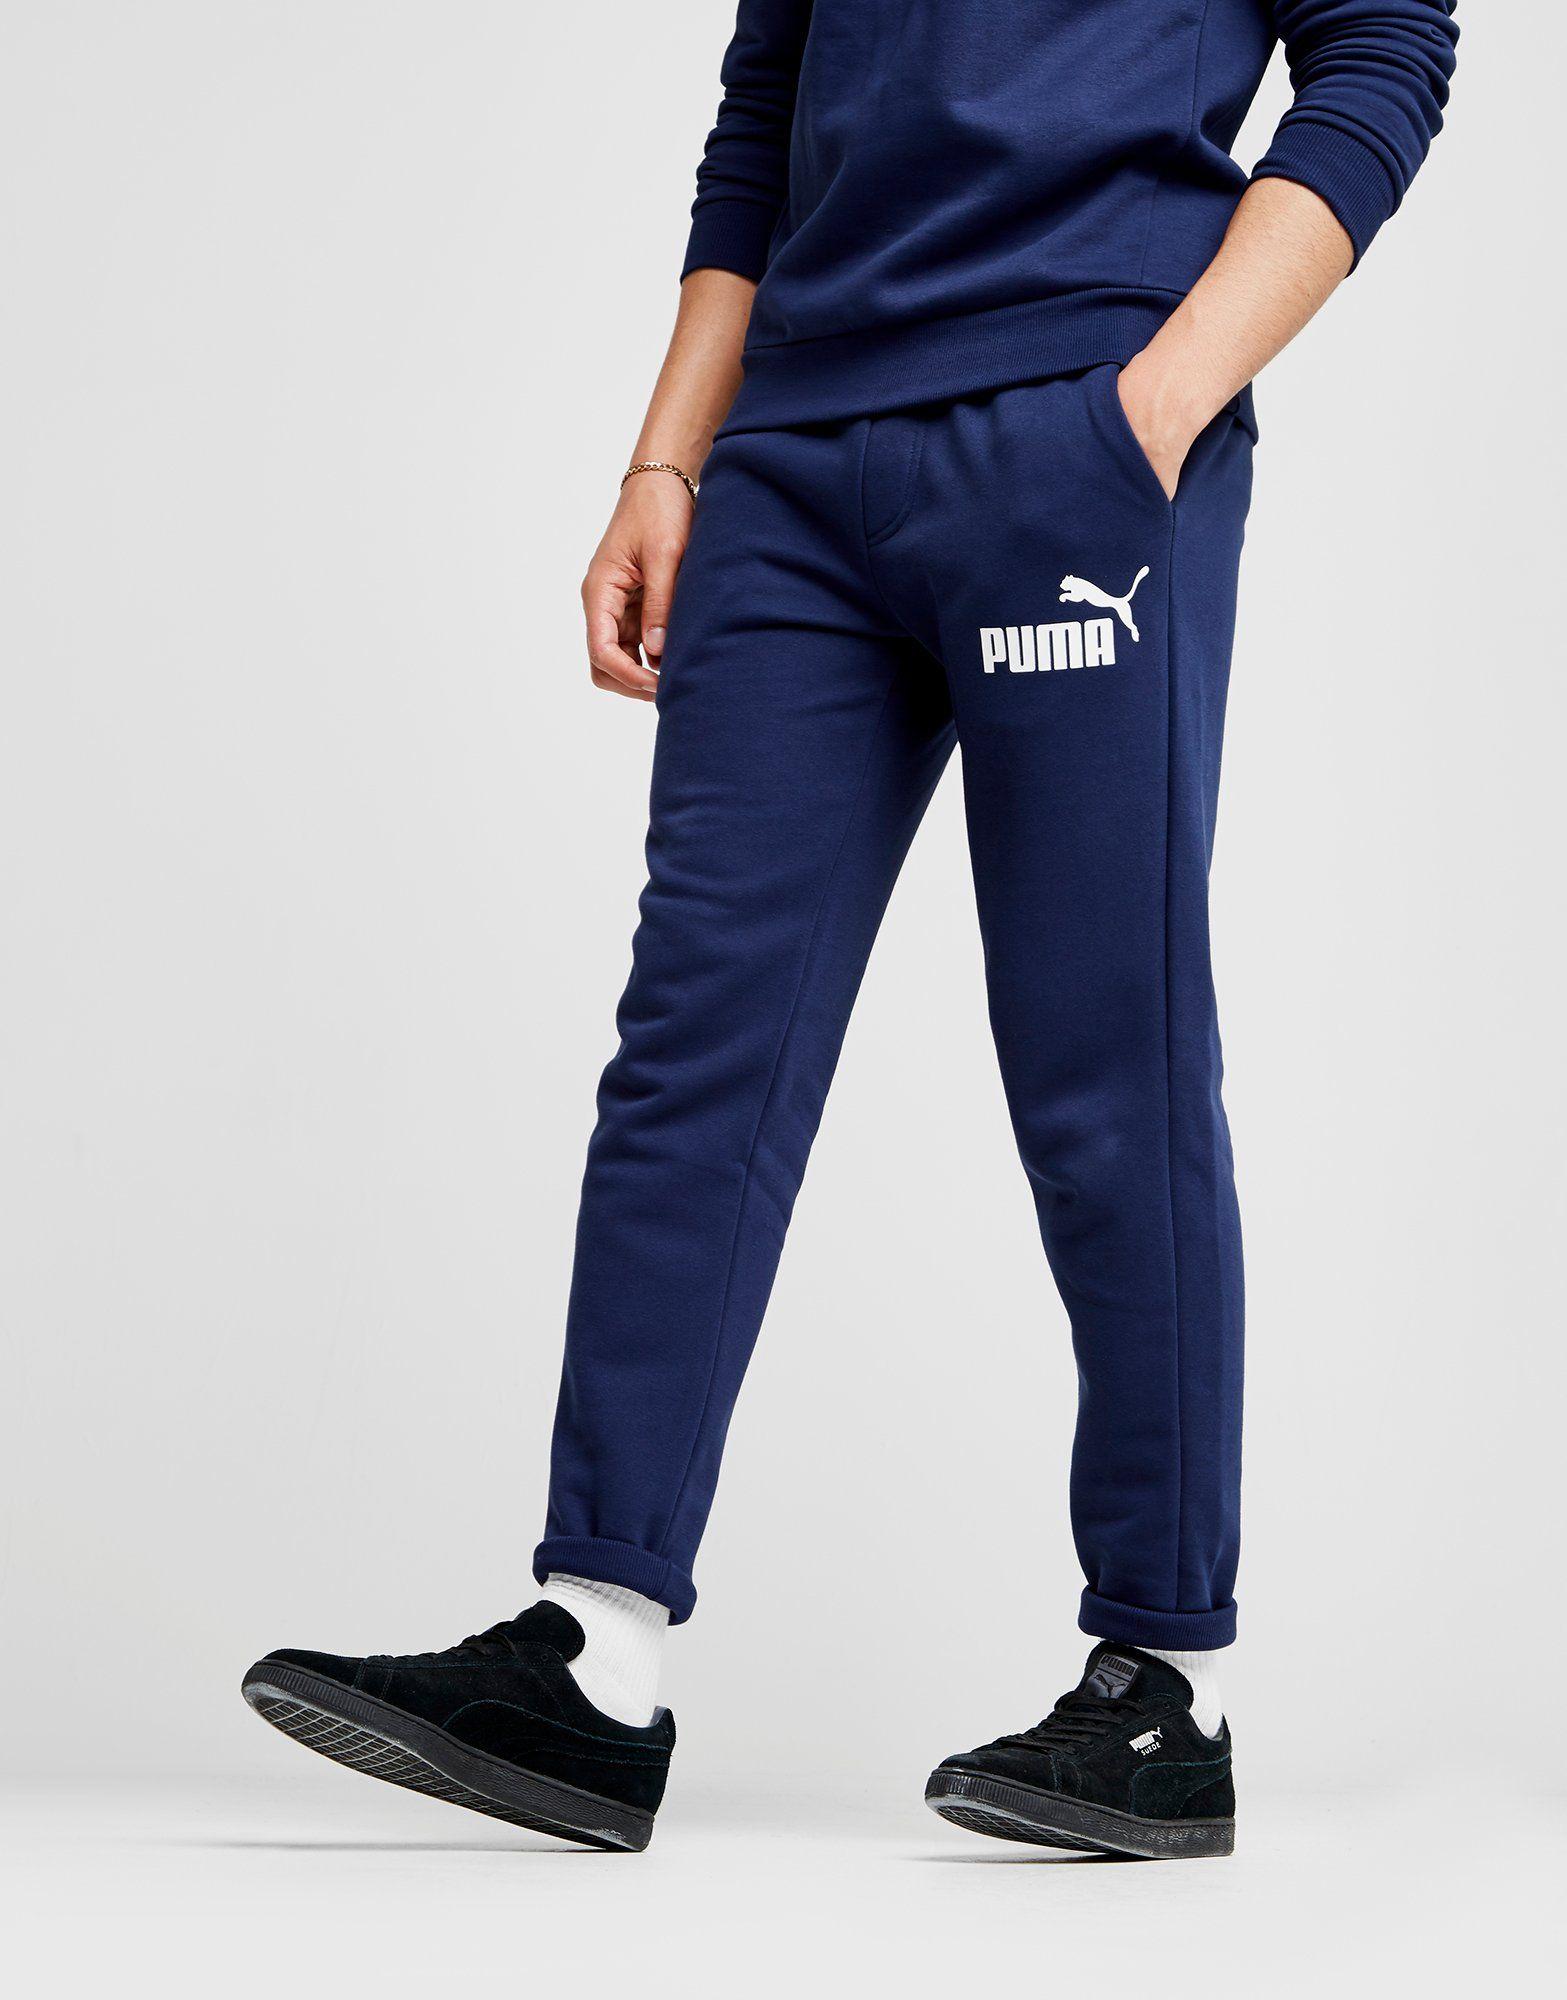 Leather gloves mens jd - Puma Core Logo Pants